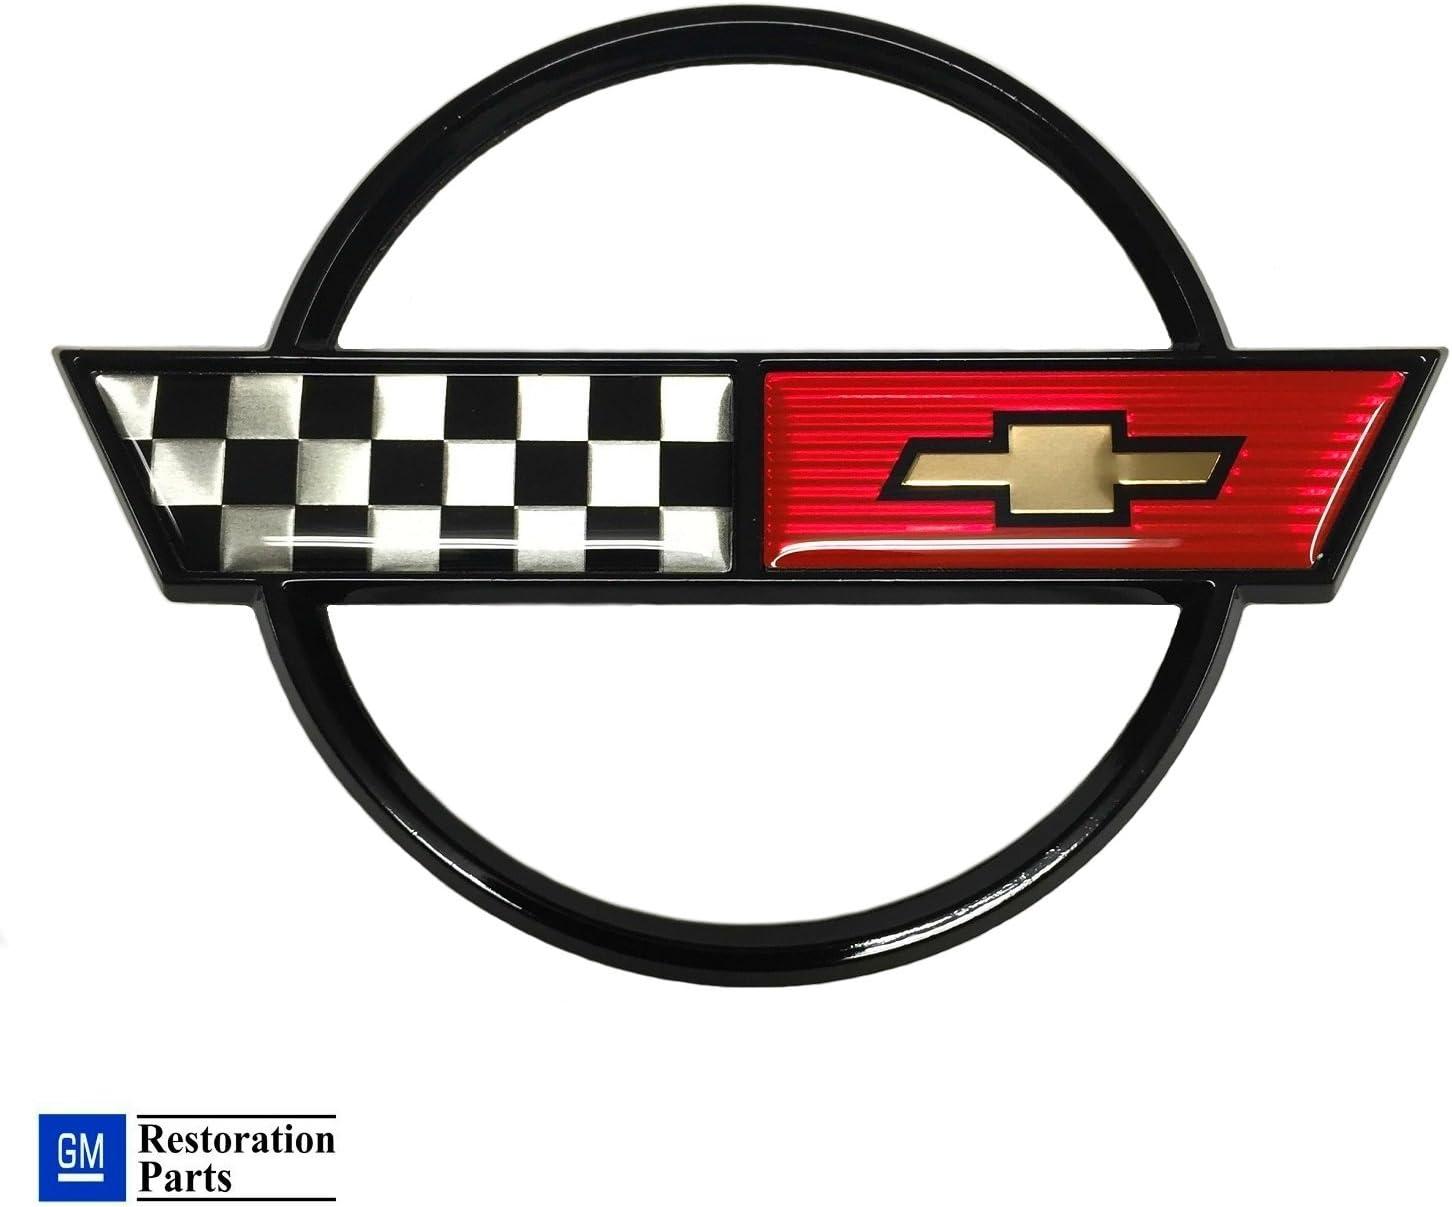 C4 Free shipping on posting reviews Corvette Rapid rise Gas Fuel Lid Emblem Cross GM Restorati Flag Official